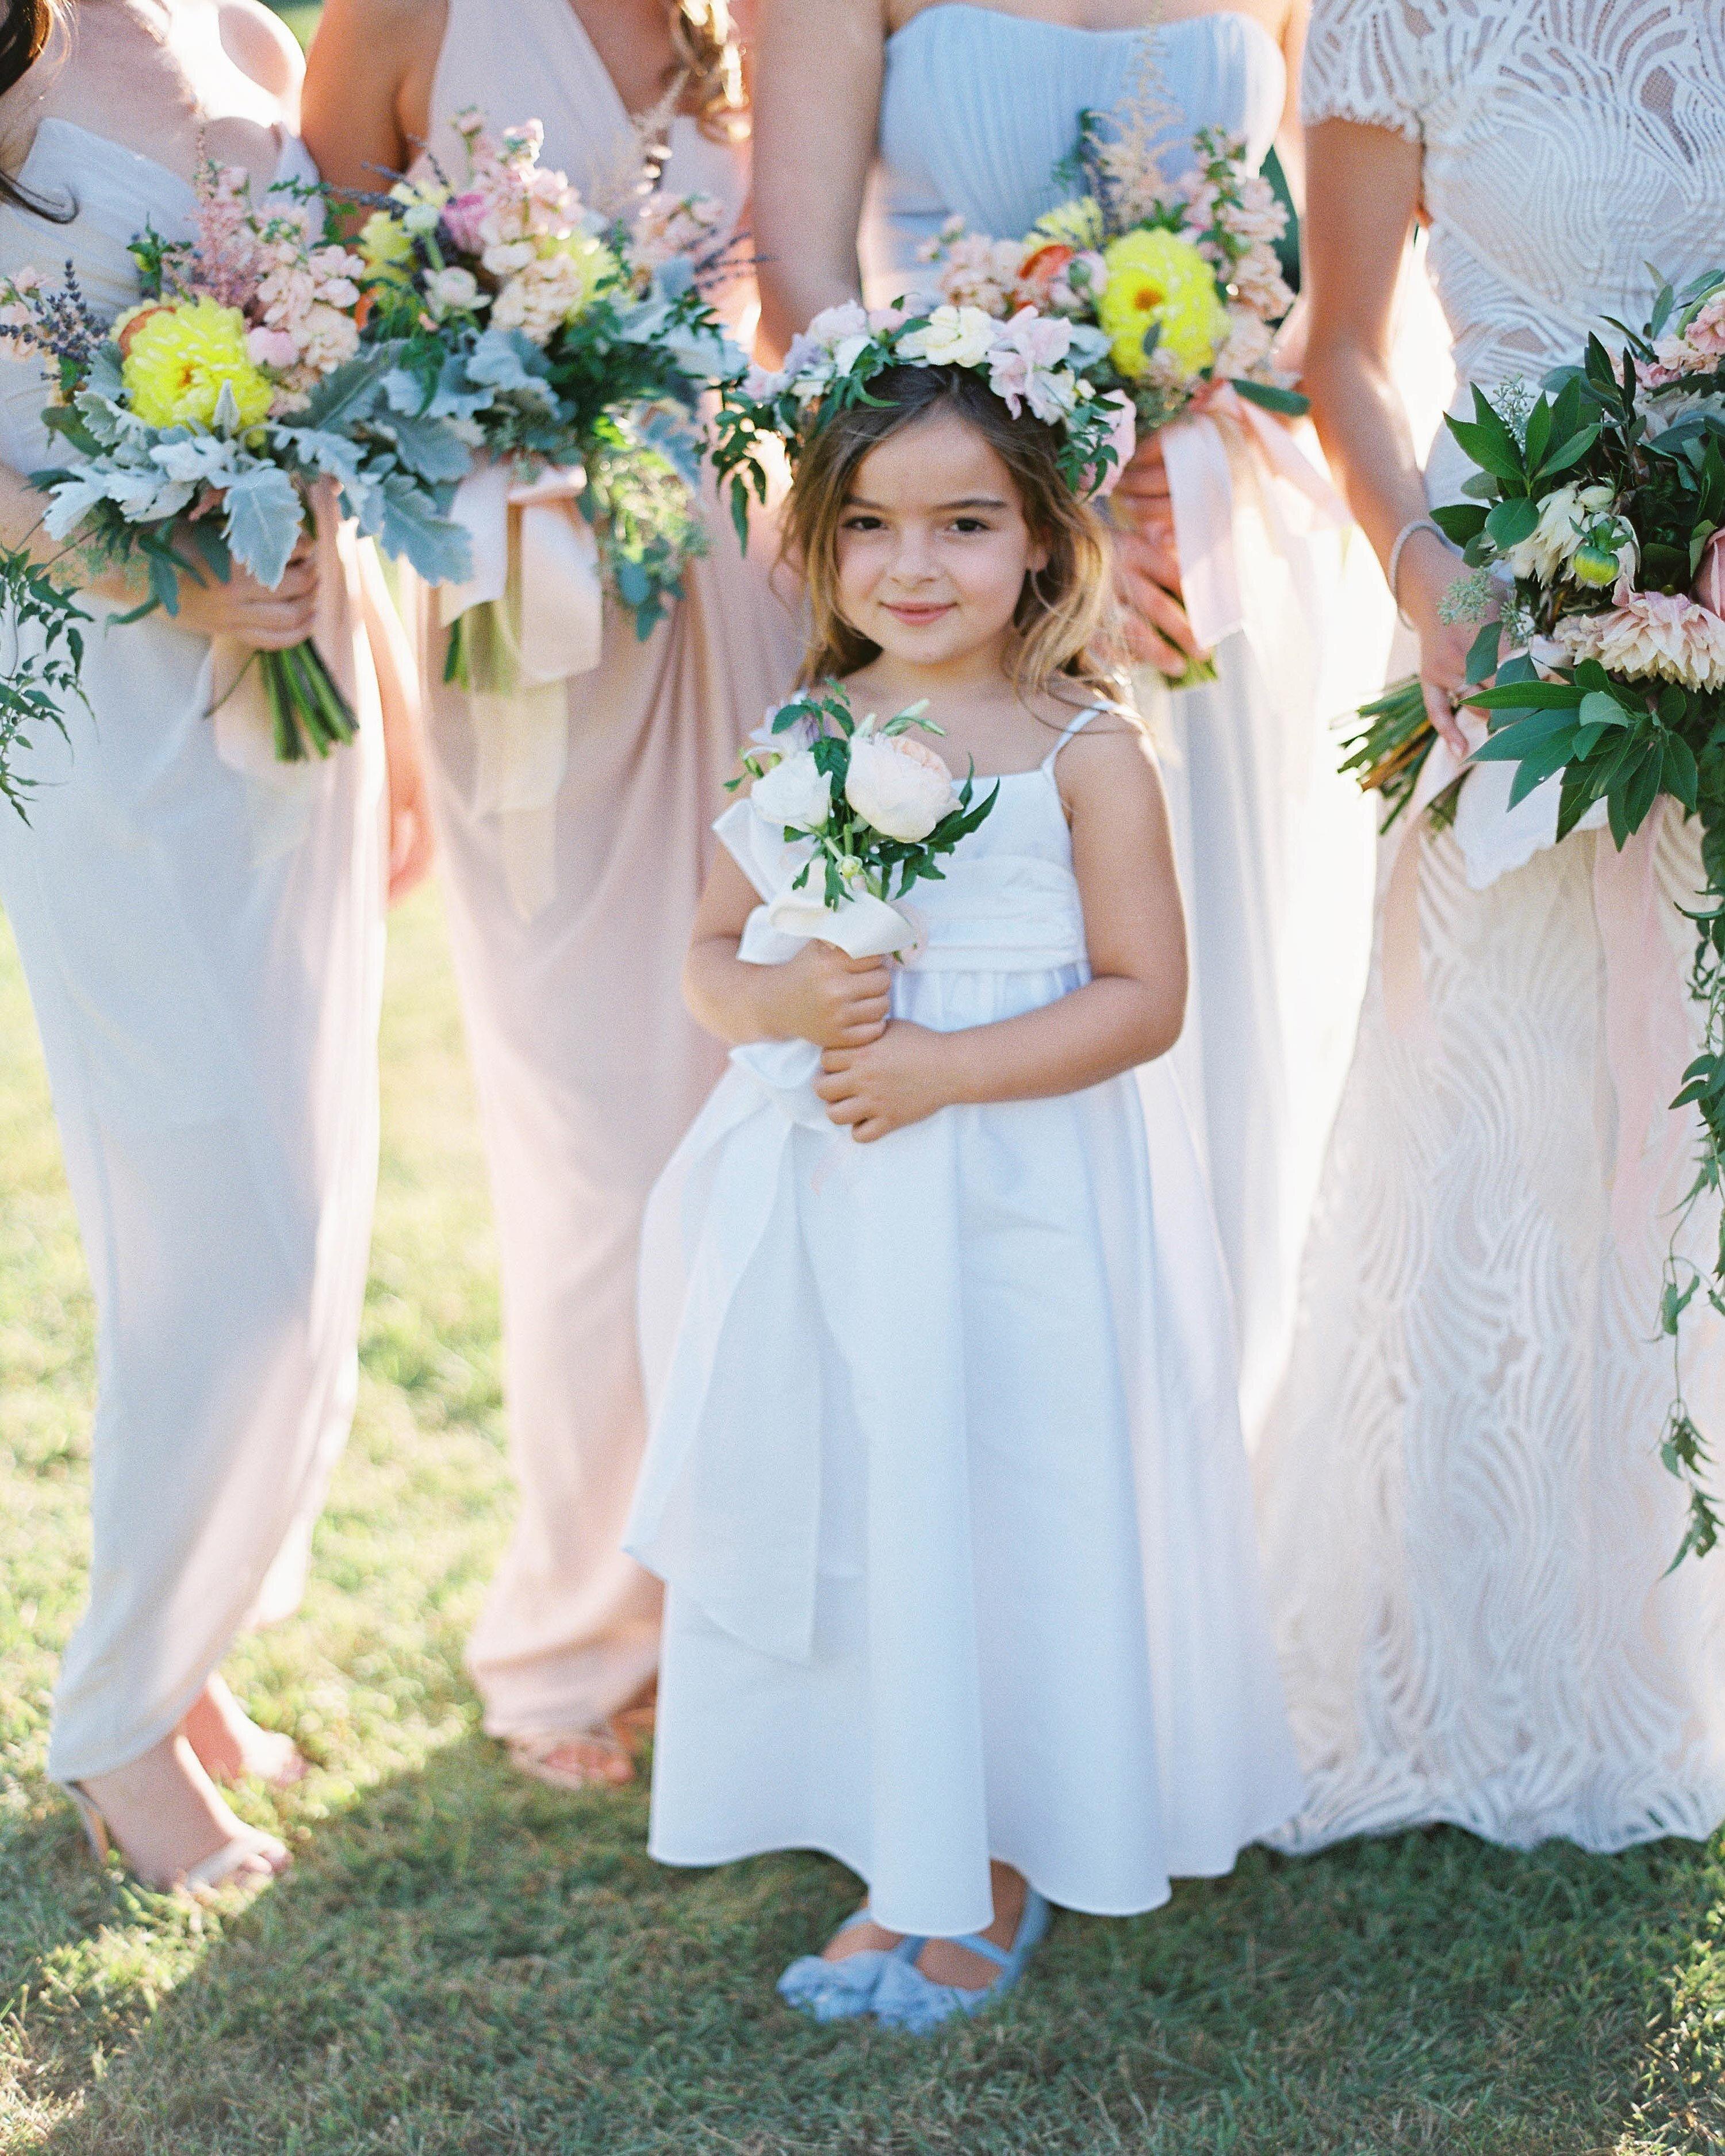 6 Tips For Choosing A Flower Girl Dress Martha Stewart Weddings